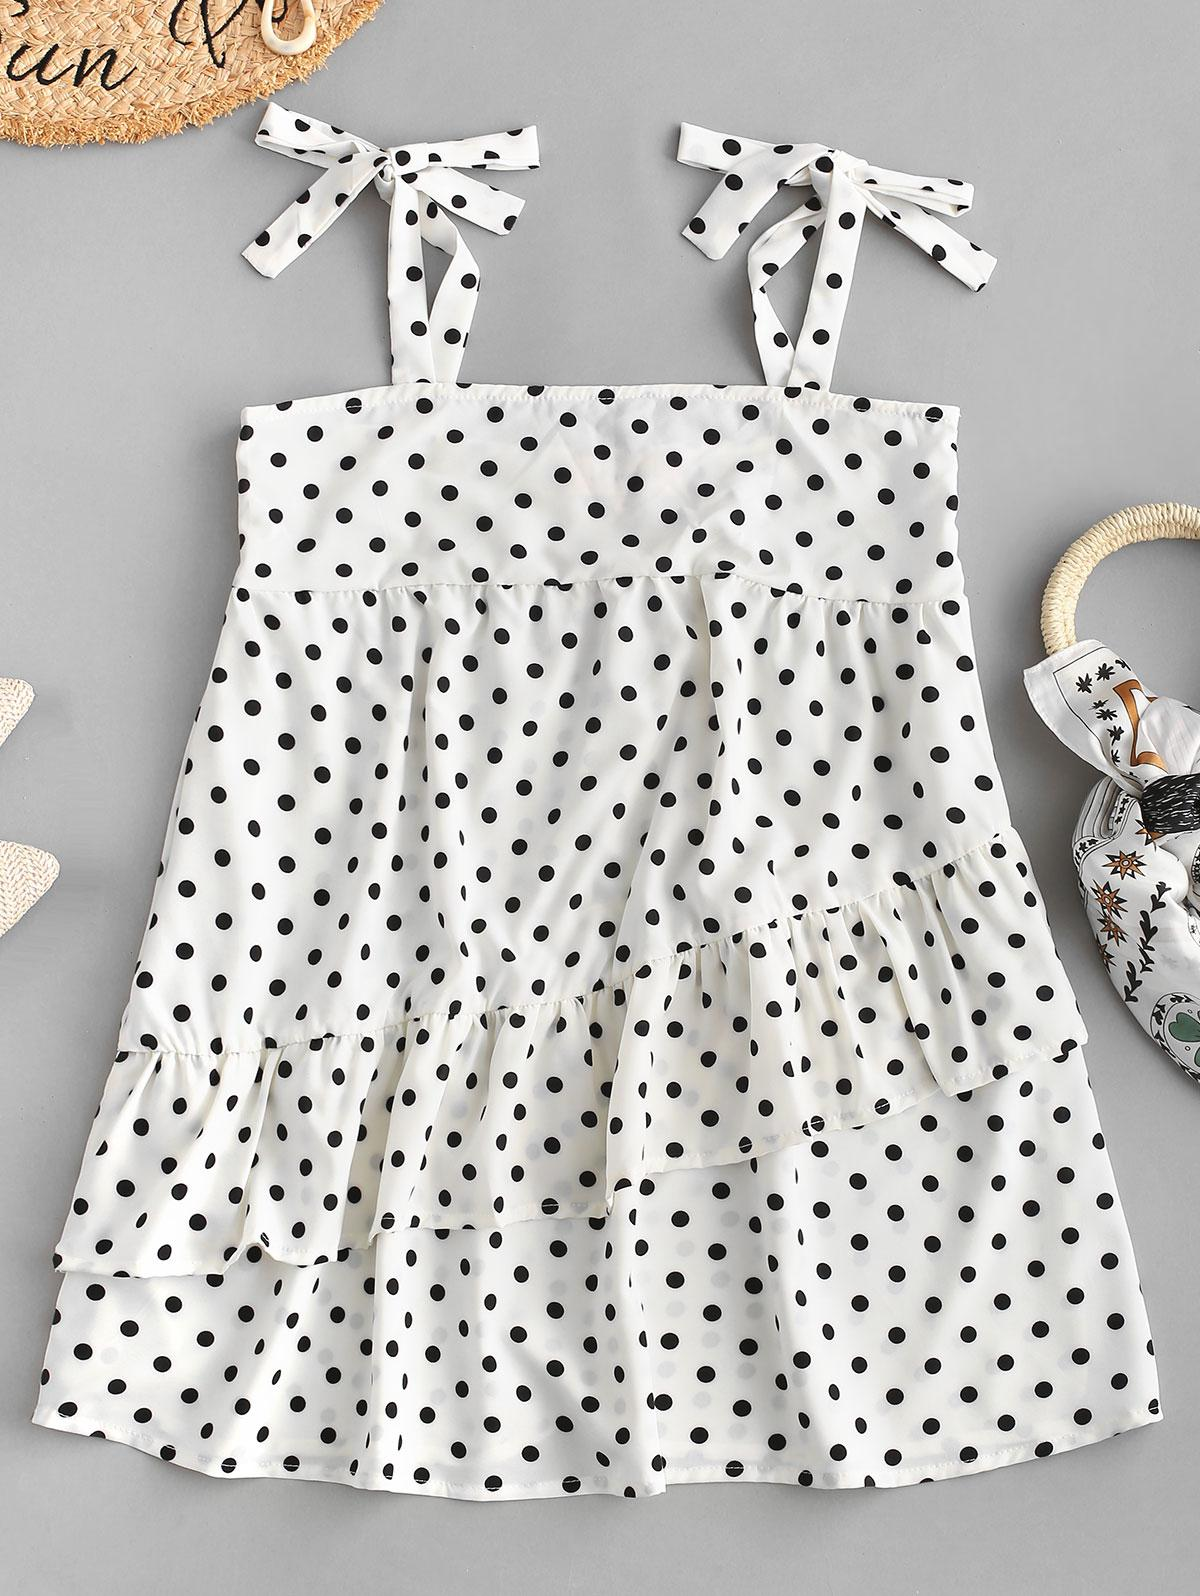 Tied Straps Polka Dot Layered Mini Dress, White